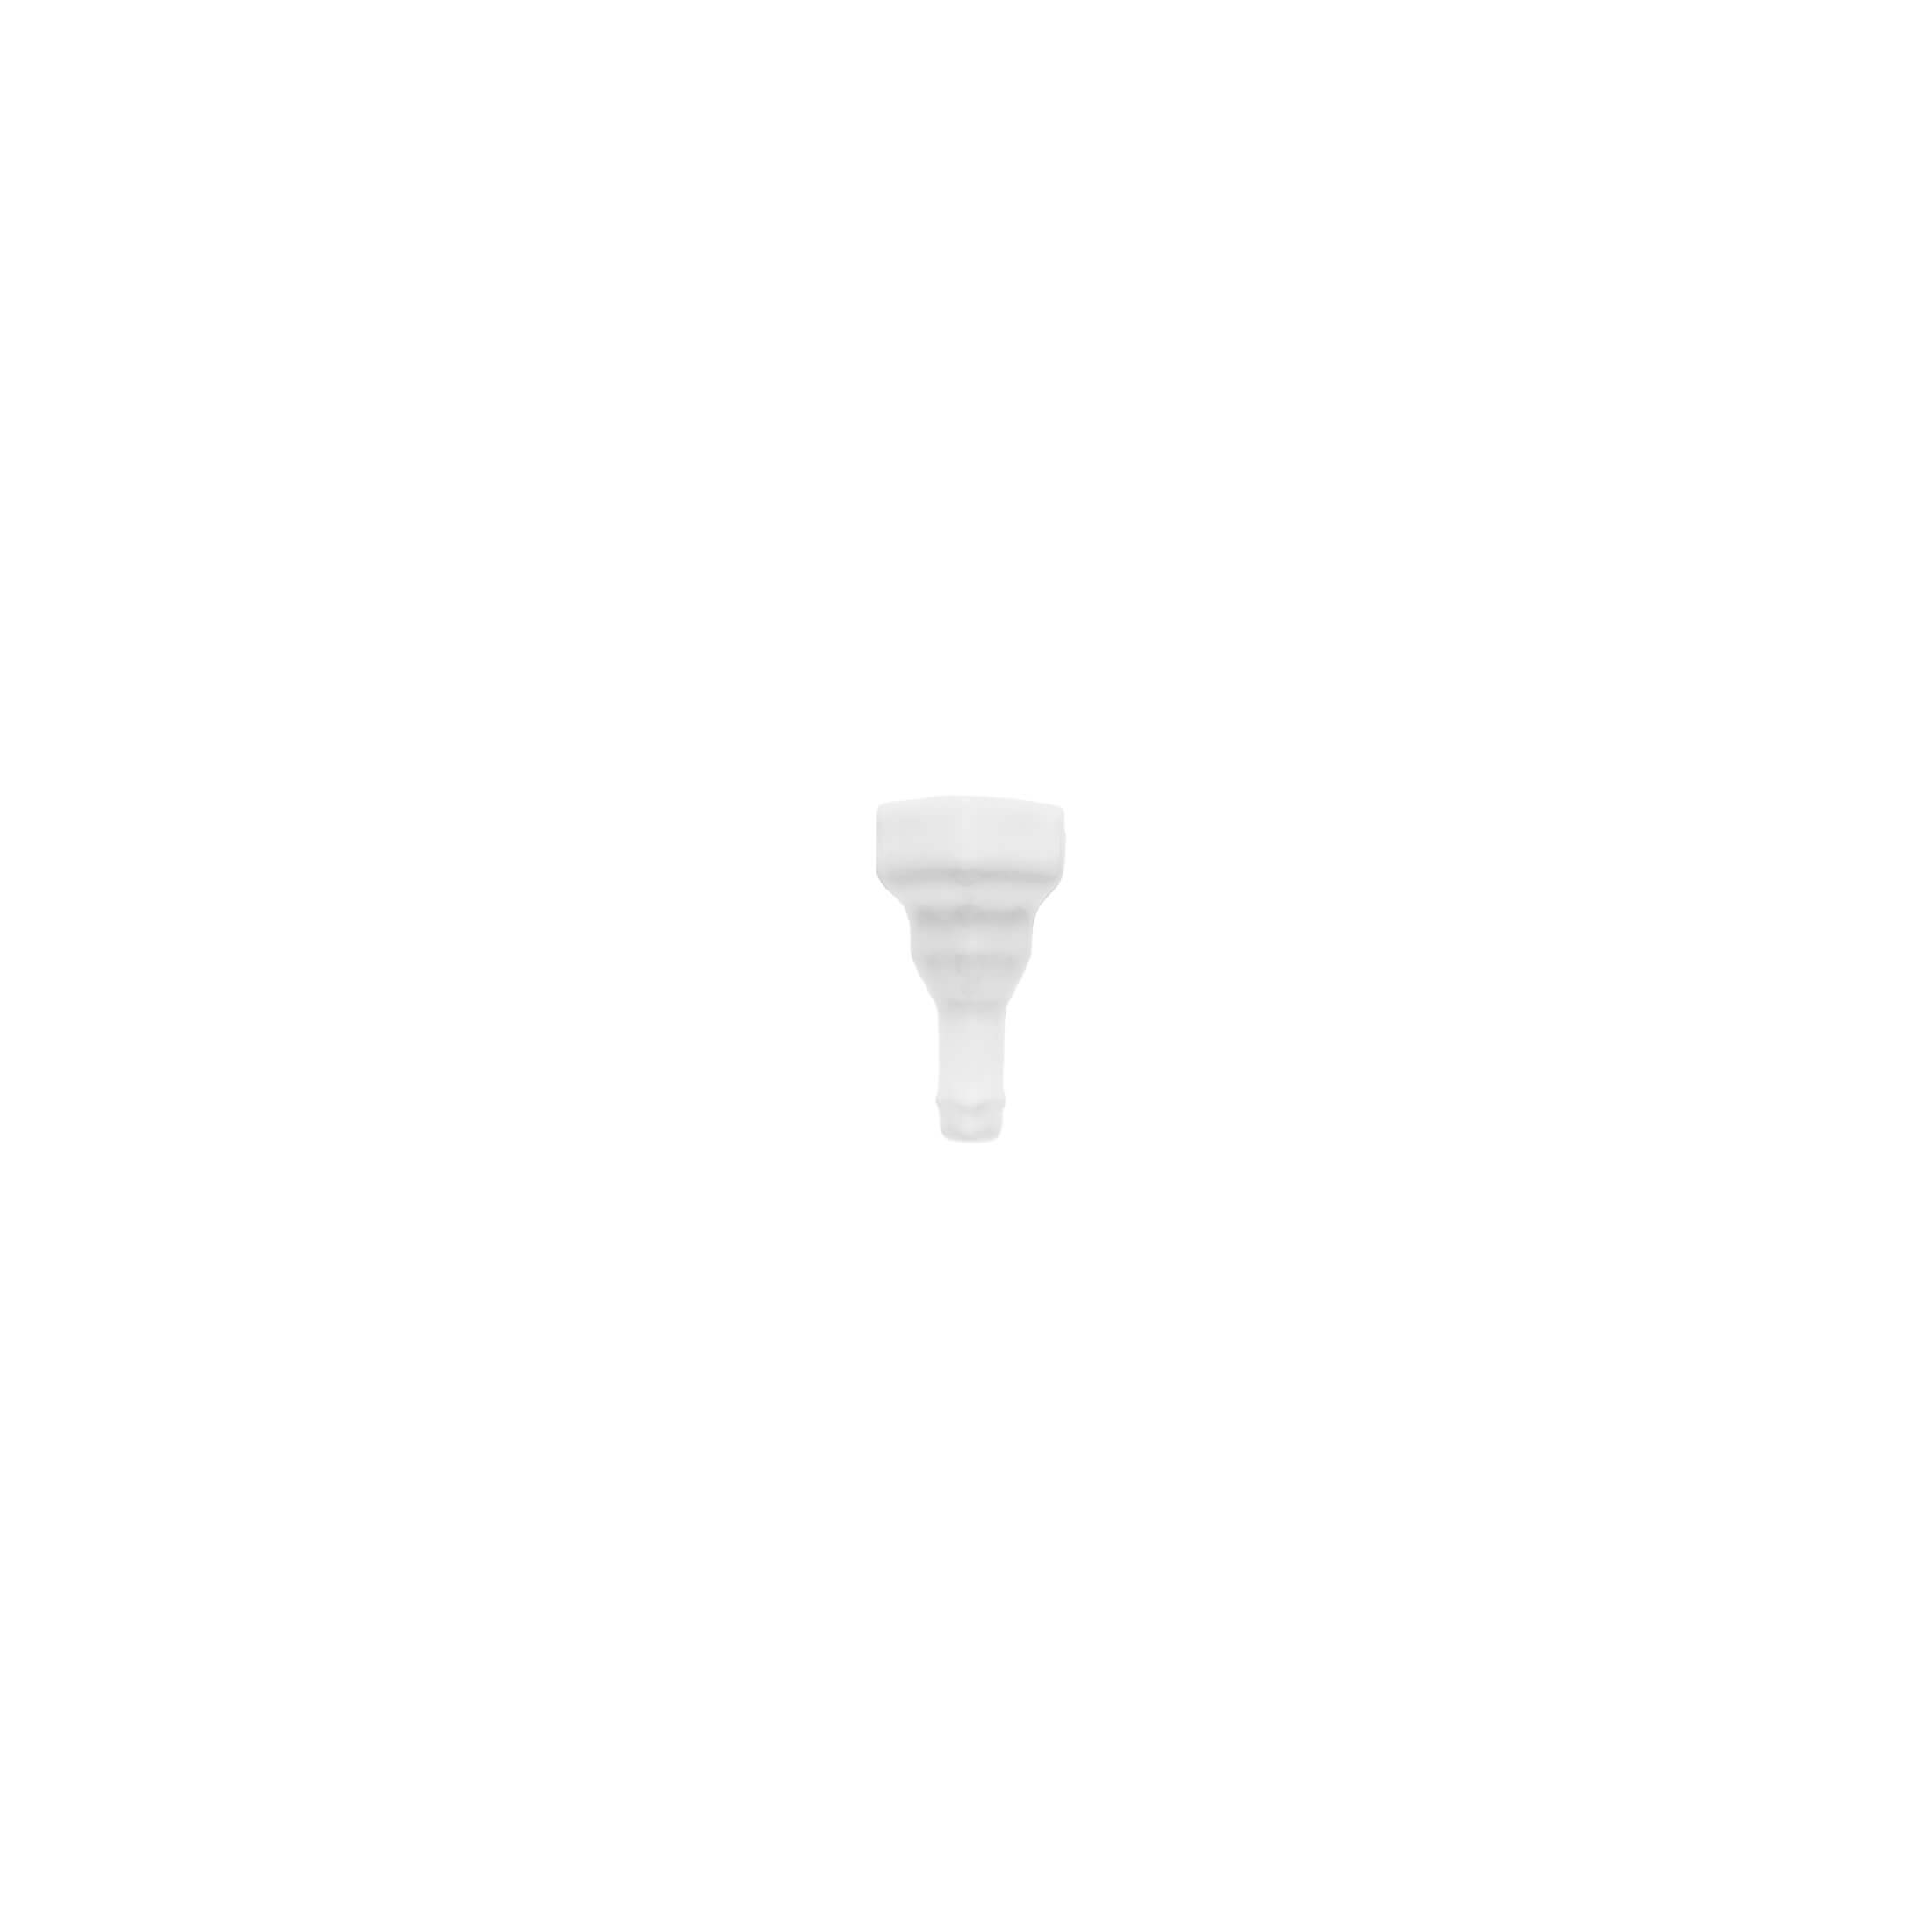 ADNE5469 - ANGULO EXTERIOR CORNISACLASICA - 5 cm X 20 cm